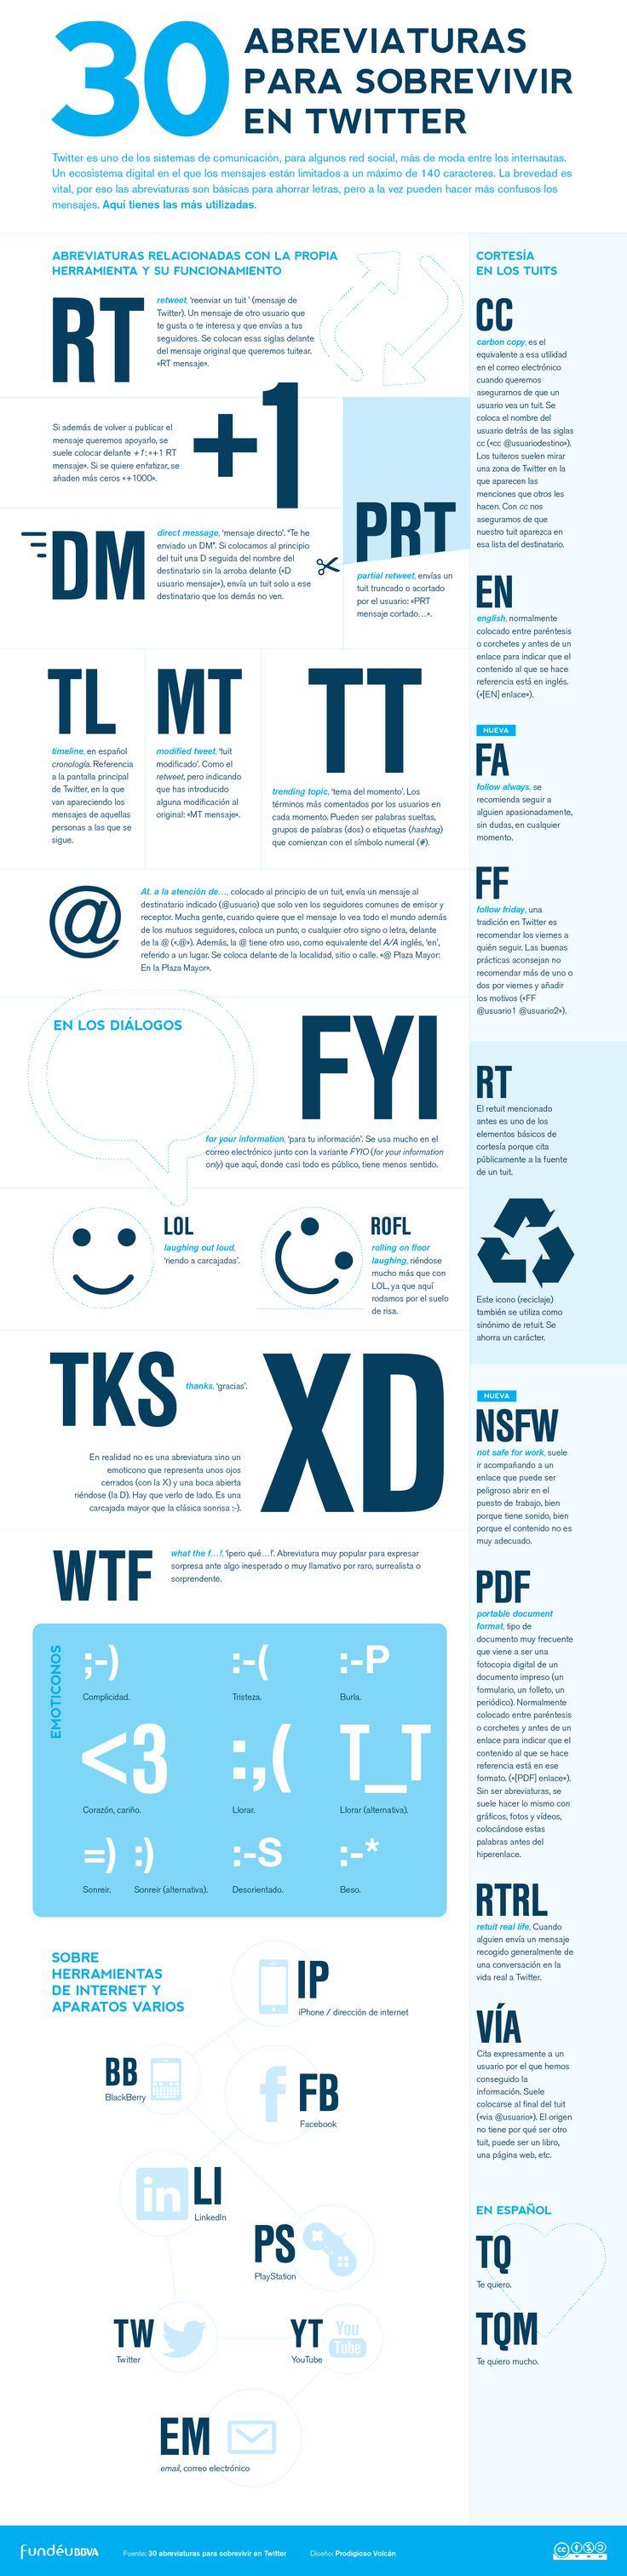 30 abreviaturas para sobrevivir en Twitter. Infografía en español. #CommunityManager